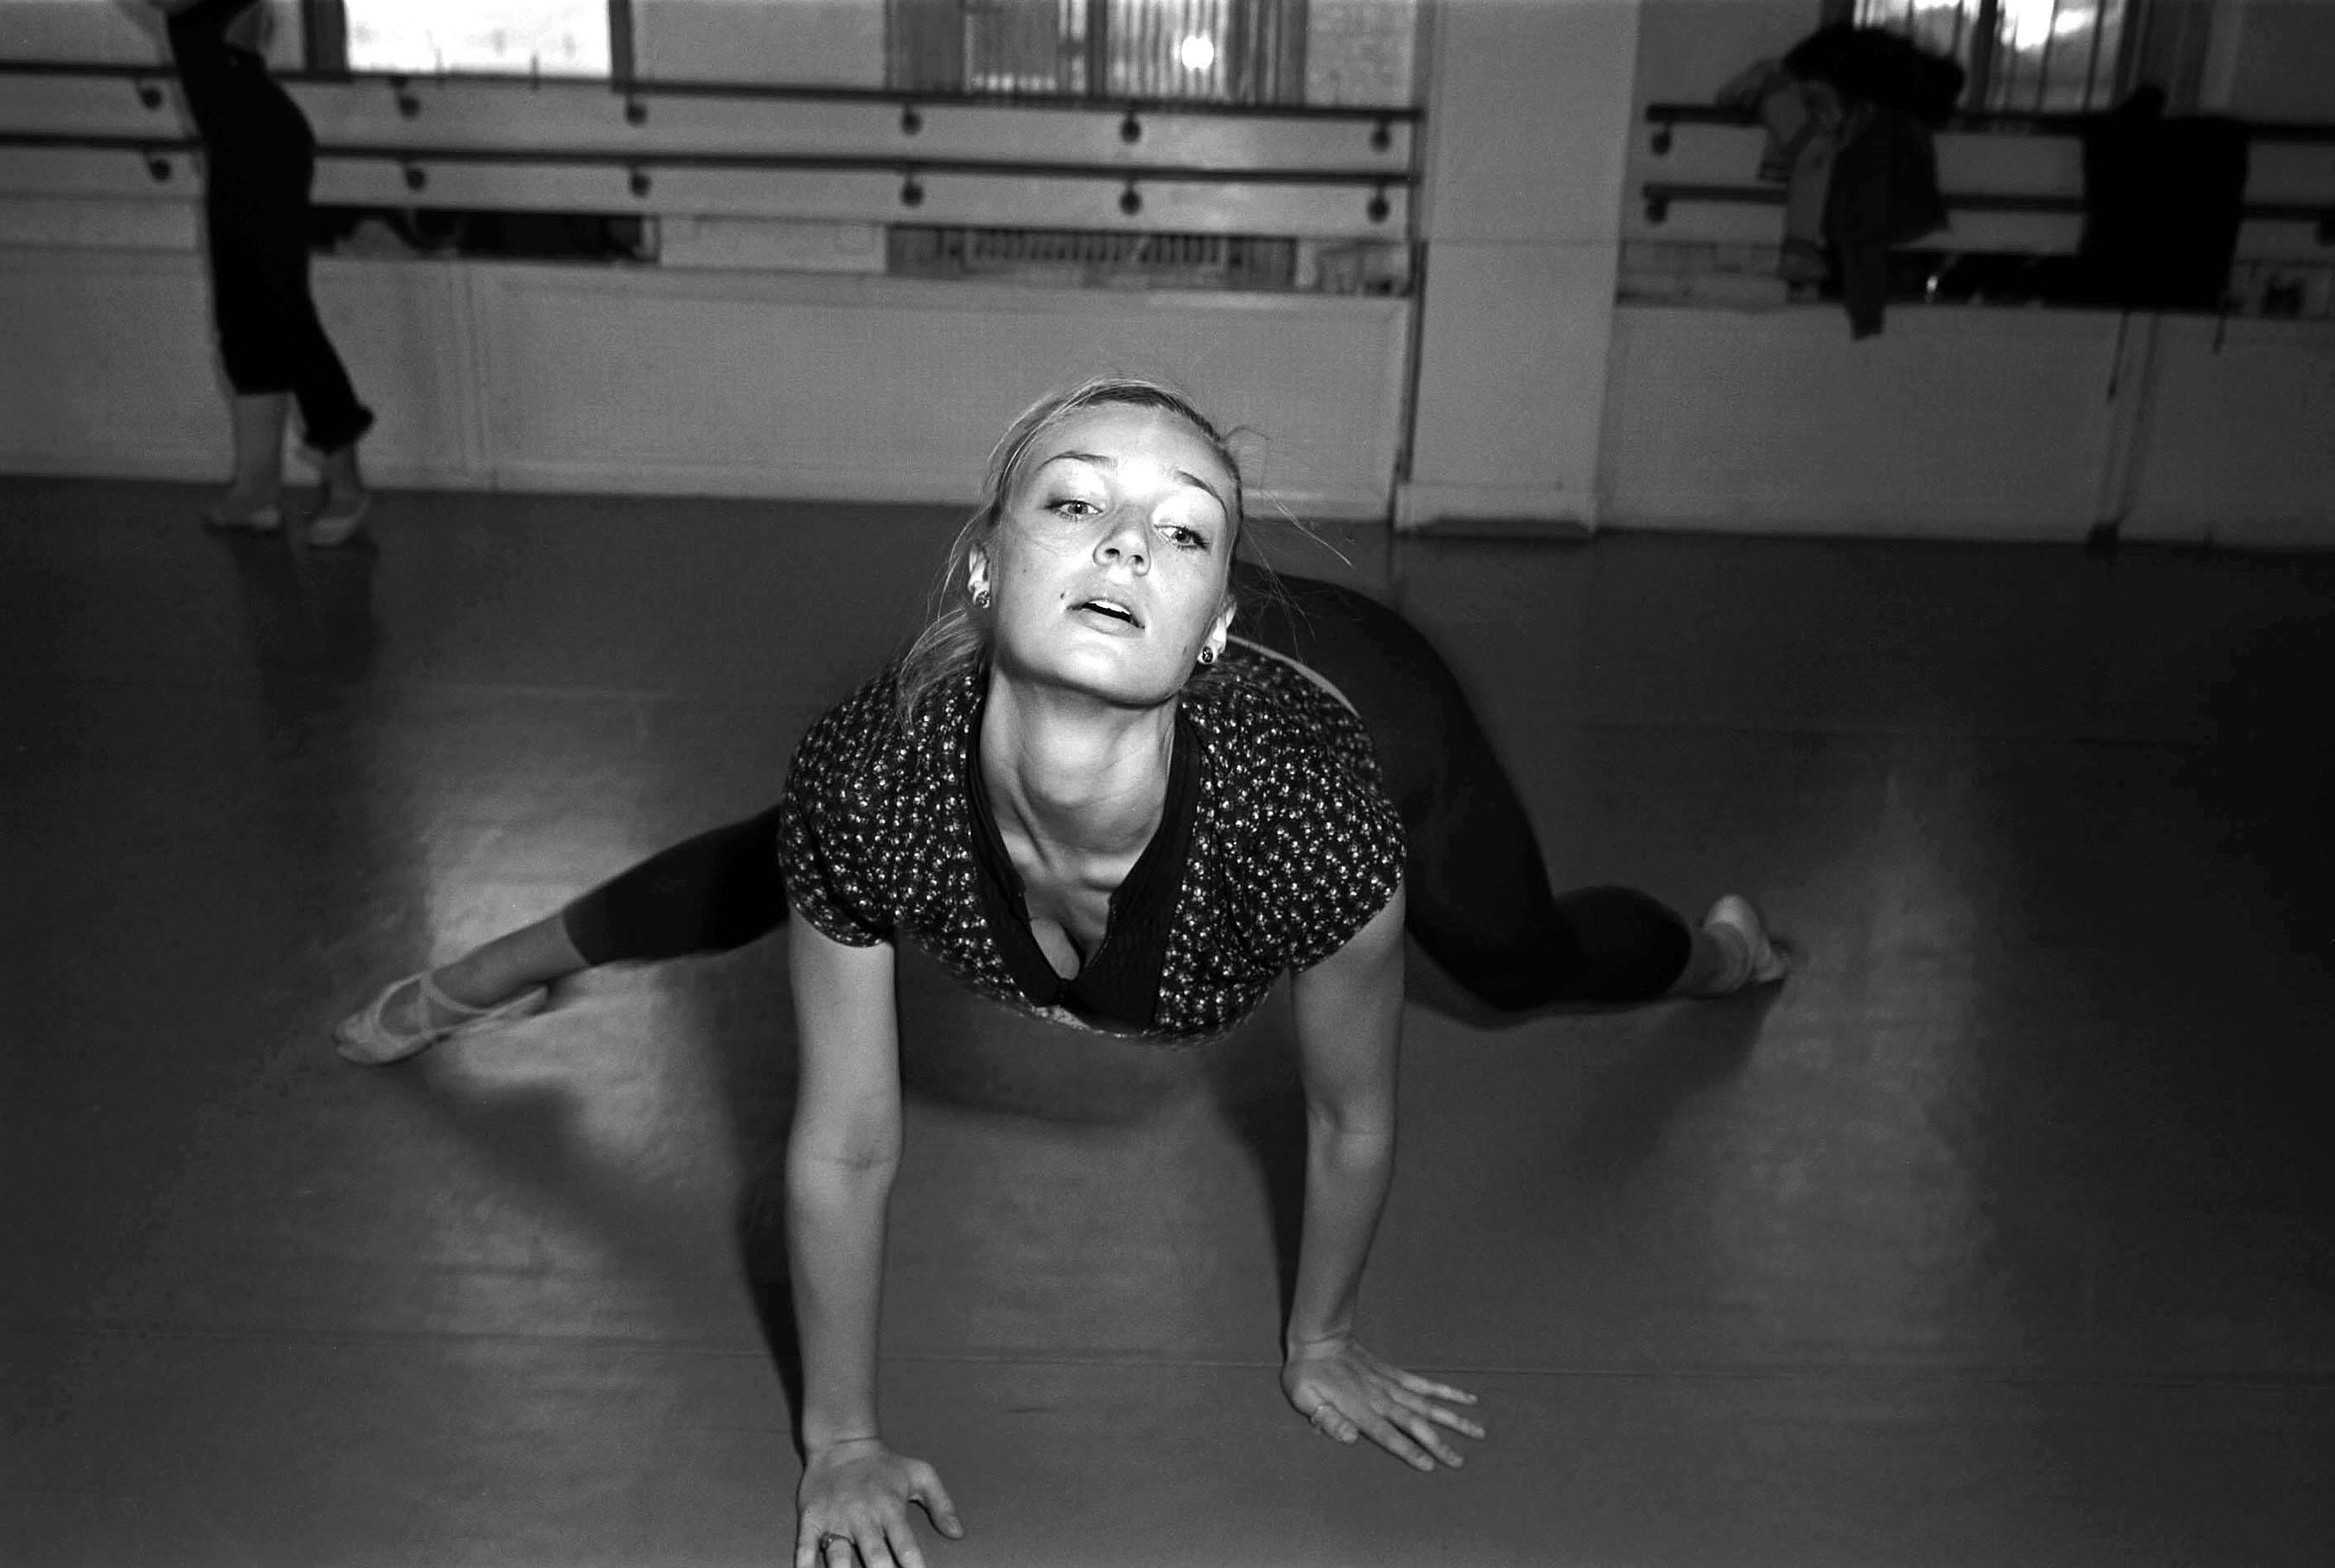 Joffrey ballet dancer in training NYC shot in real film.